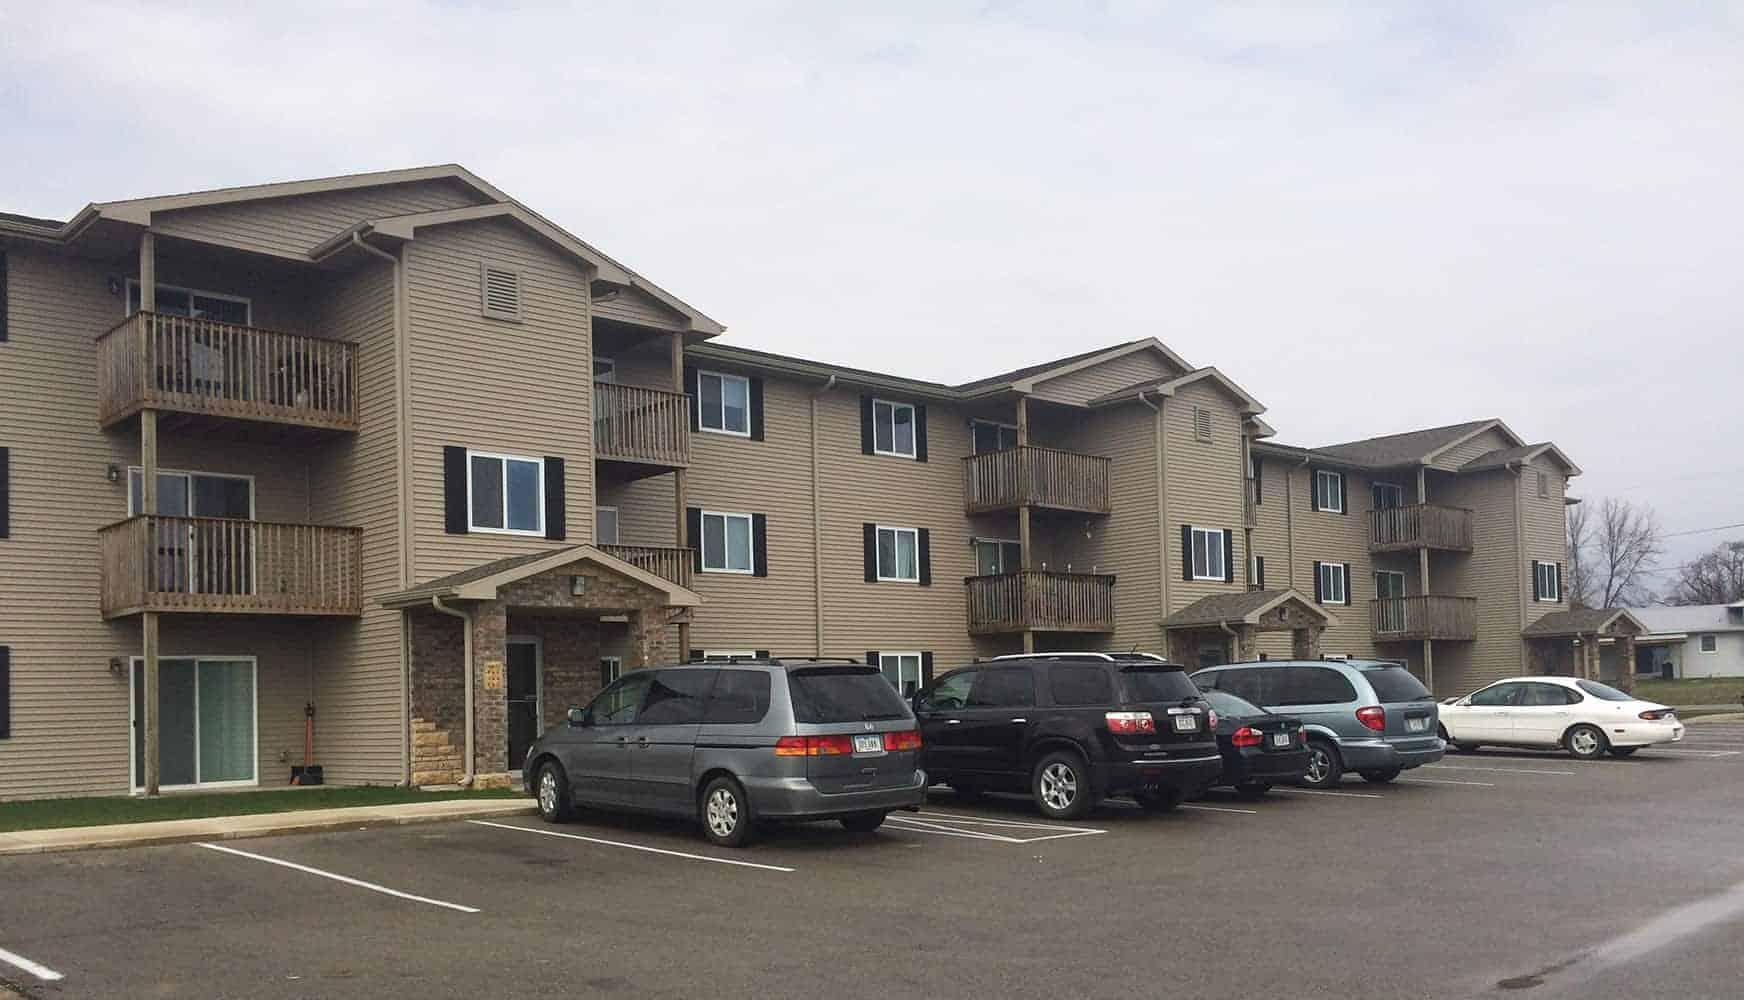 The-Gardens-Apartments-1-Bedroom-2-Bedroom-Farley-Iowa